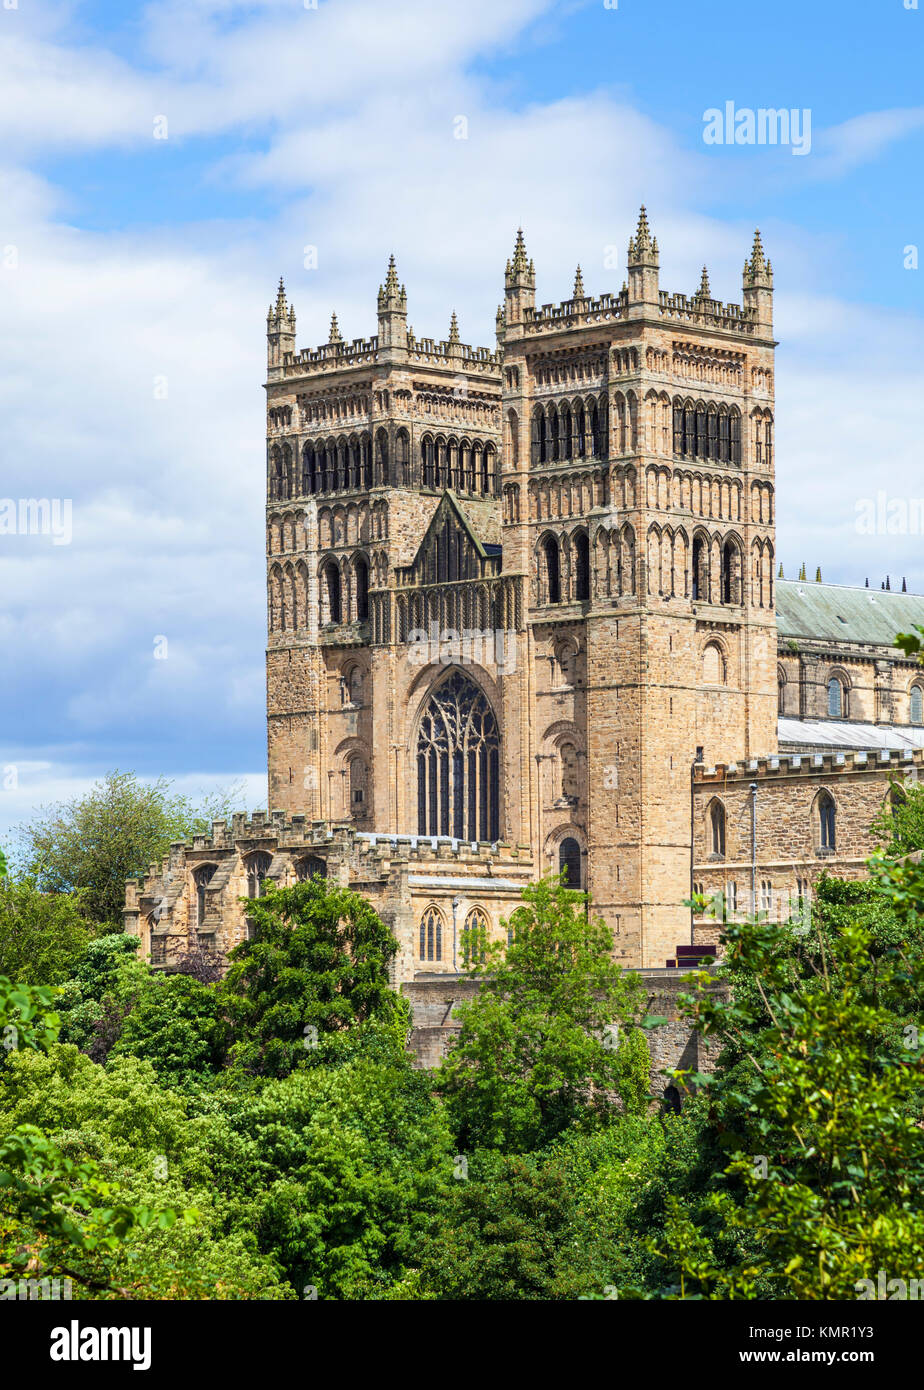 Angleterre Angleterre Durham Durham cathedral Durham County Durham Angleterre façade uk aller eu Europe Photo Stock